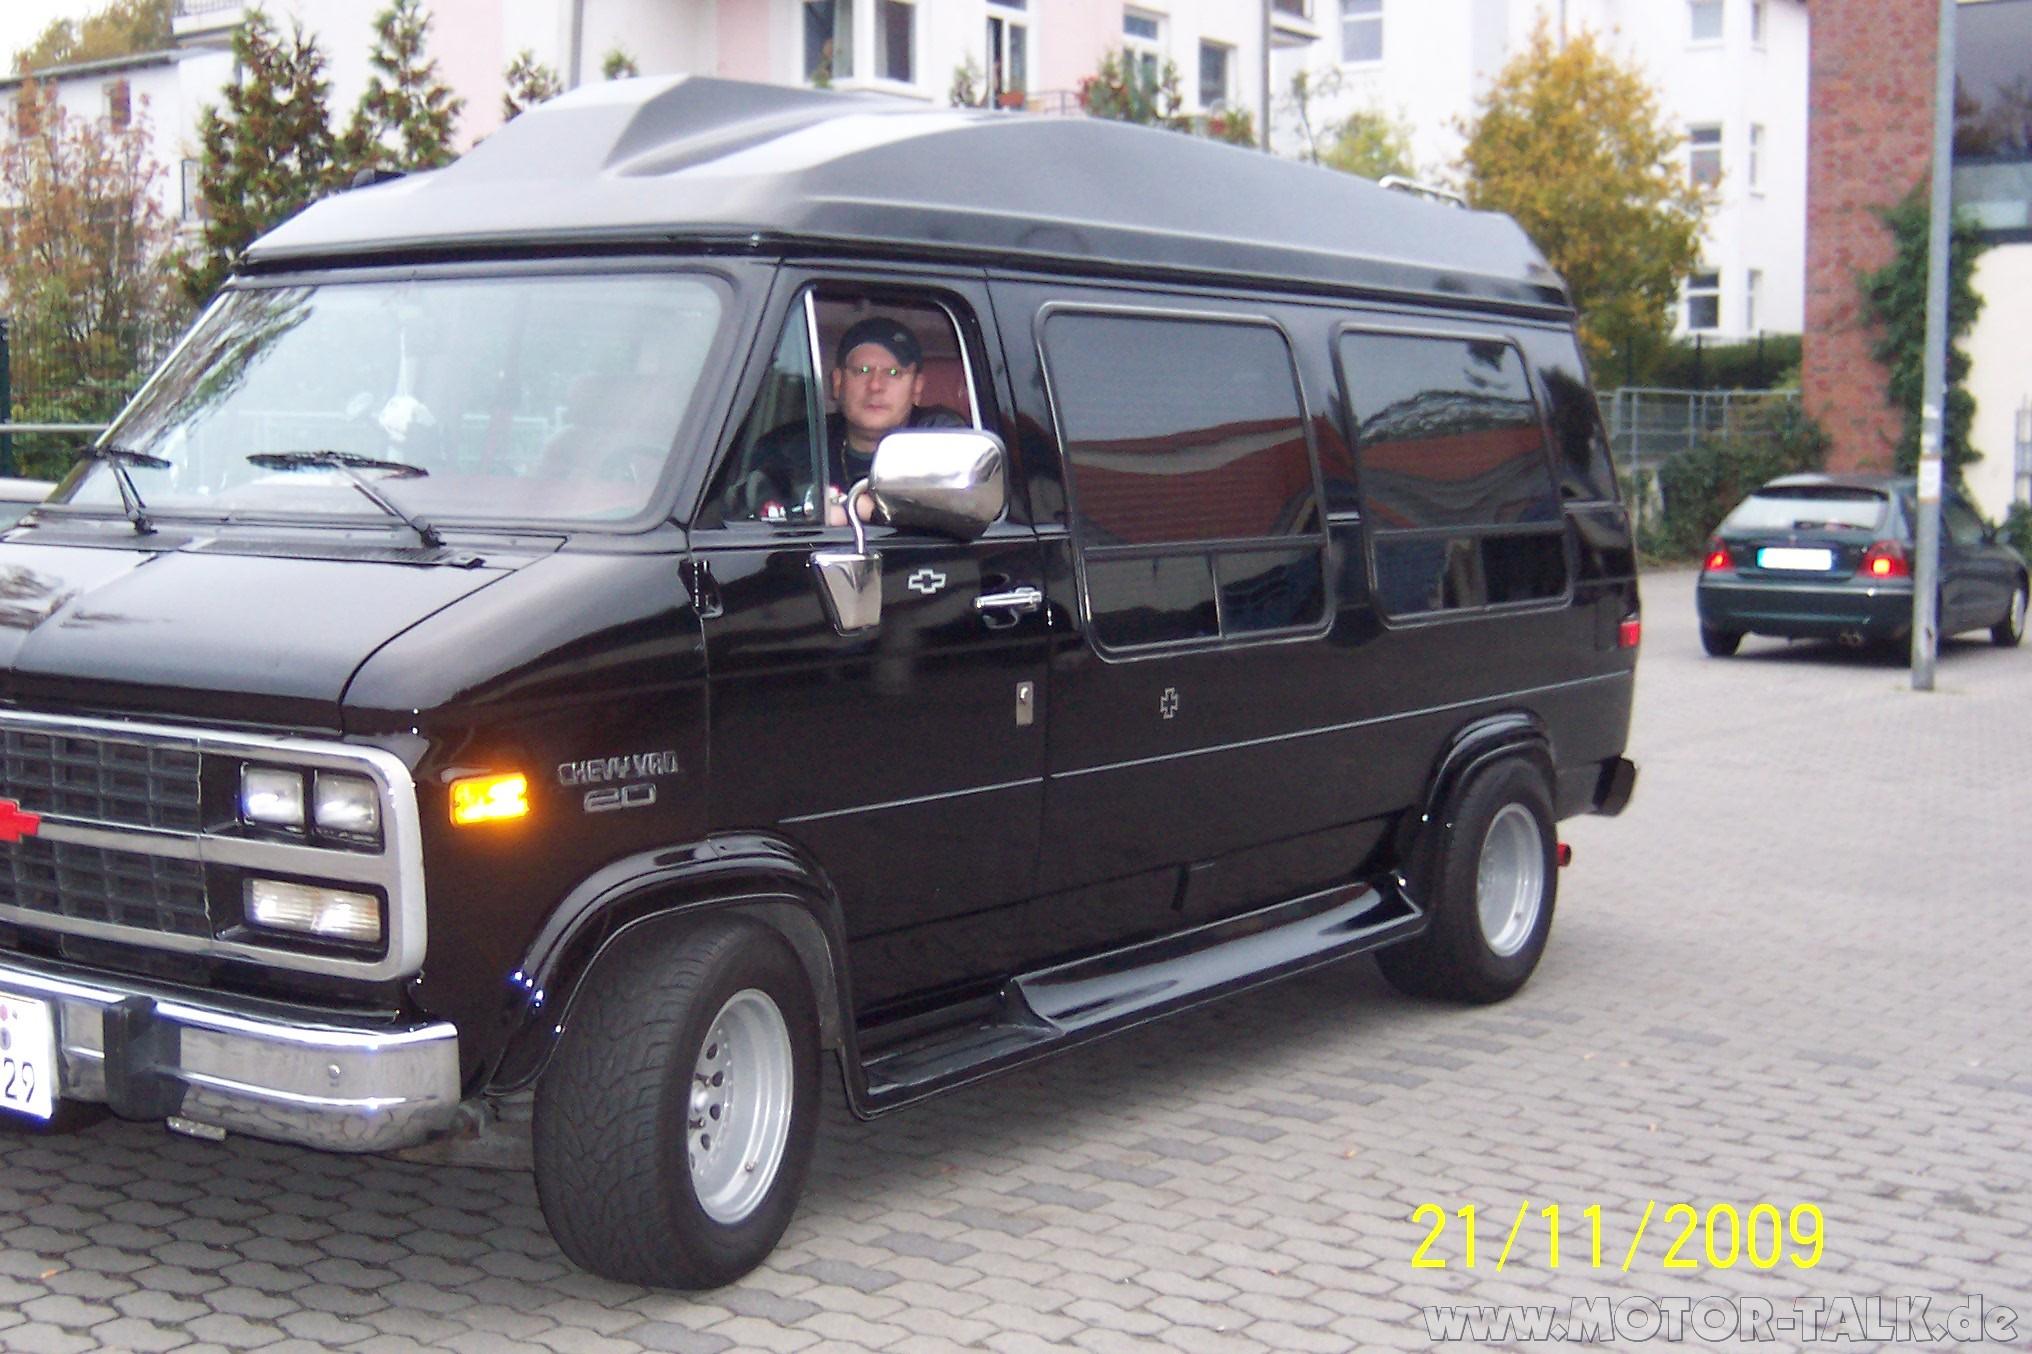 chevrolet van g20 picture 11 reviews news specs buy car. Black Bedroom Furniture Sets. Home Design Ideas